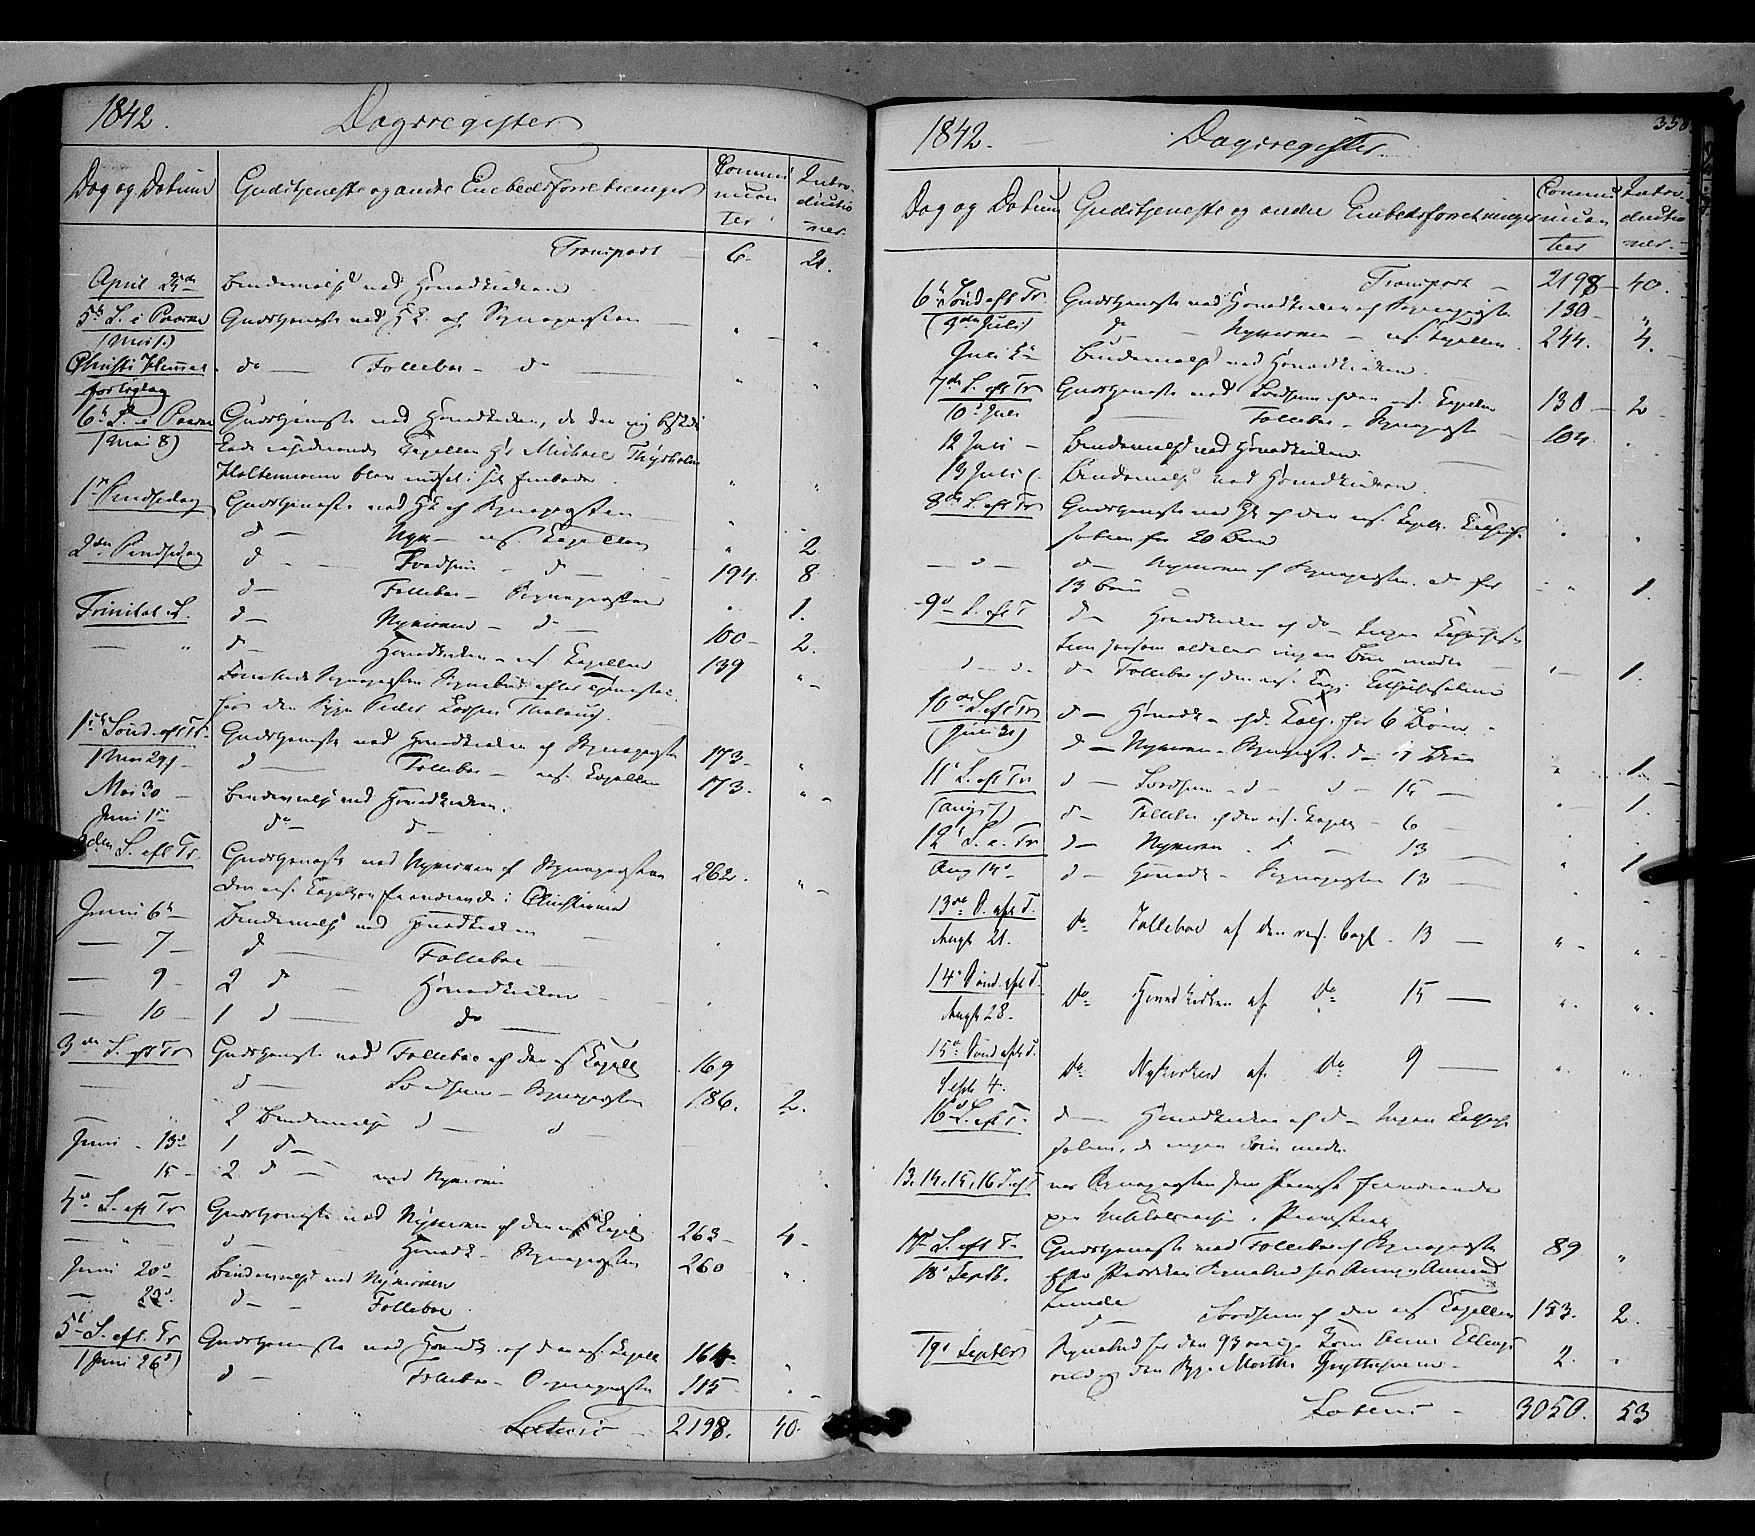 SAH, Gausdal prestekontor, Ministerialbok nr. 7, 1840-1850, s. 358